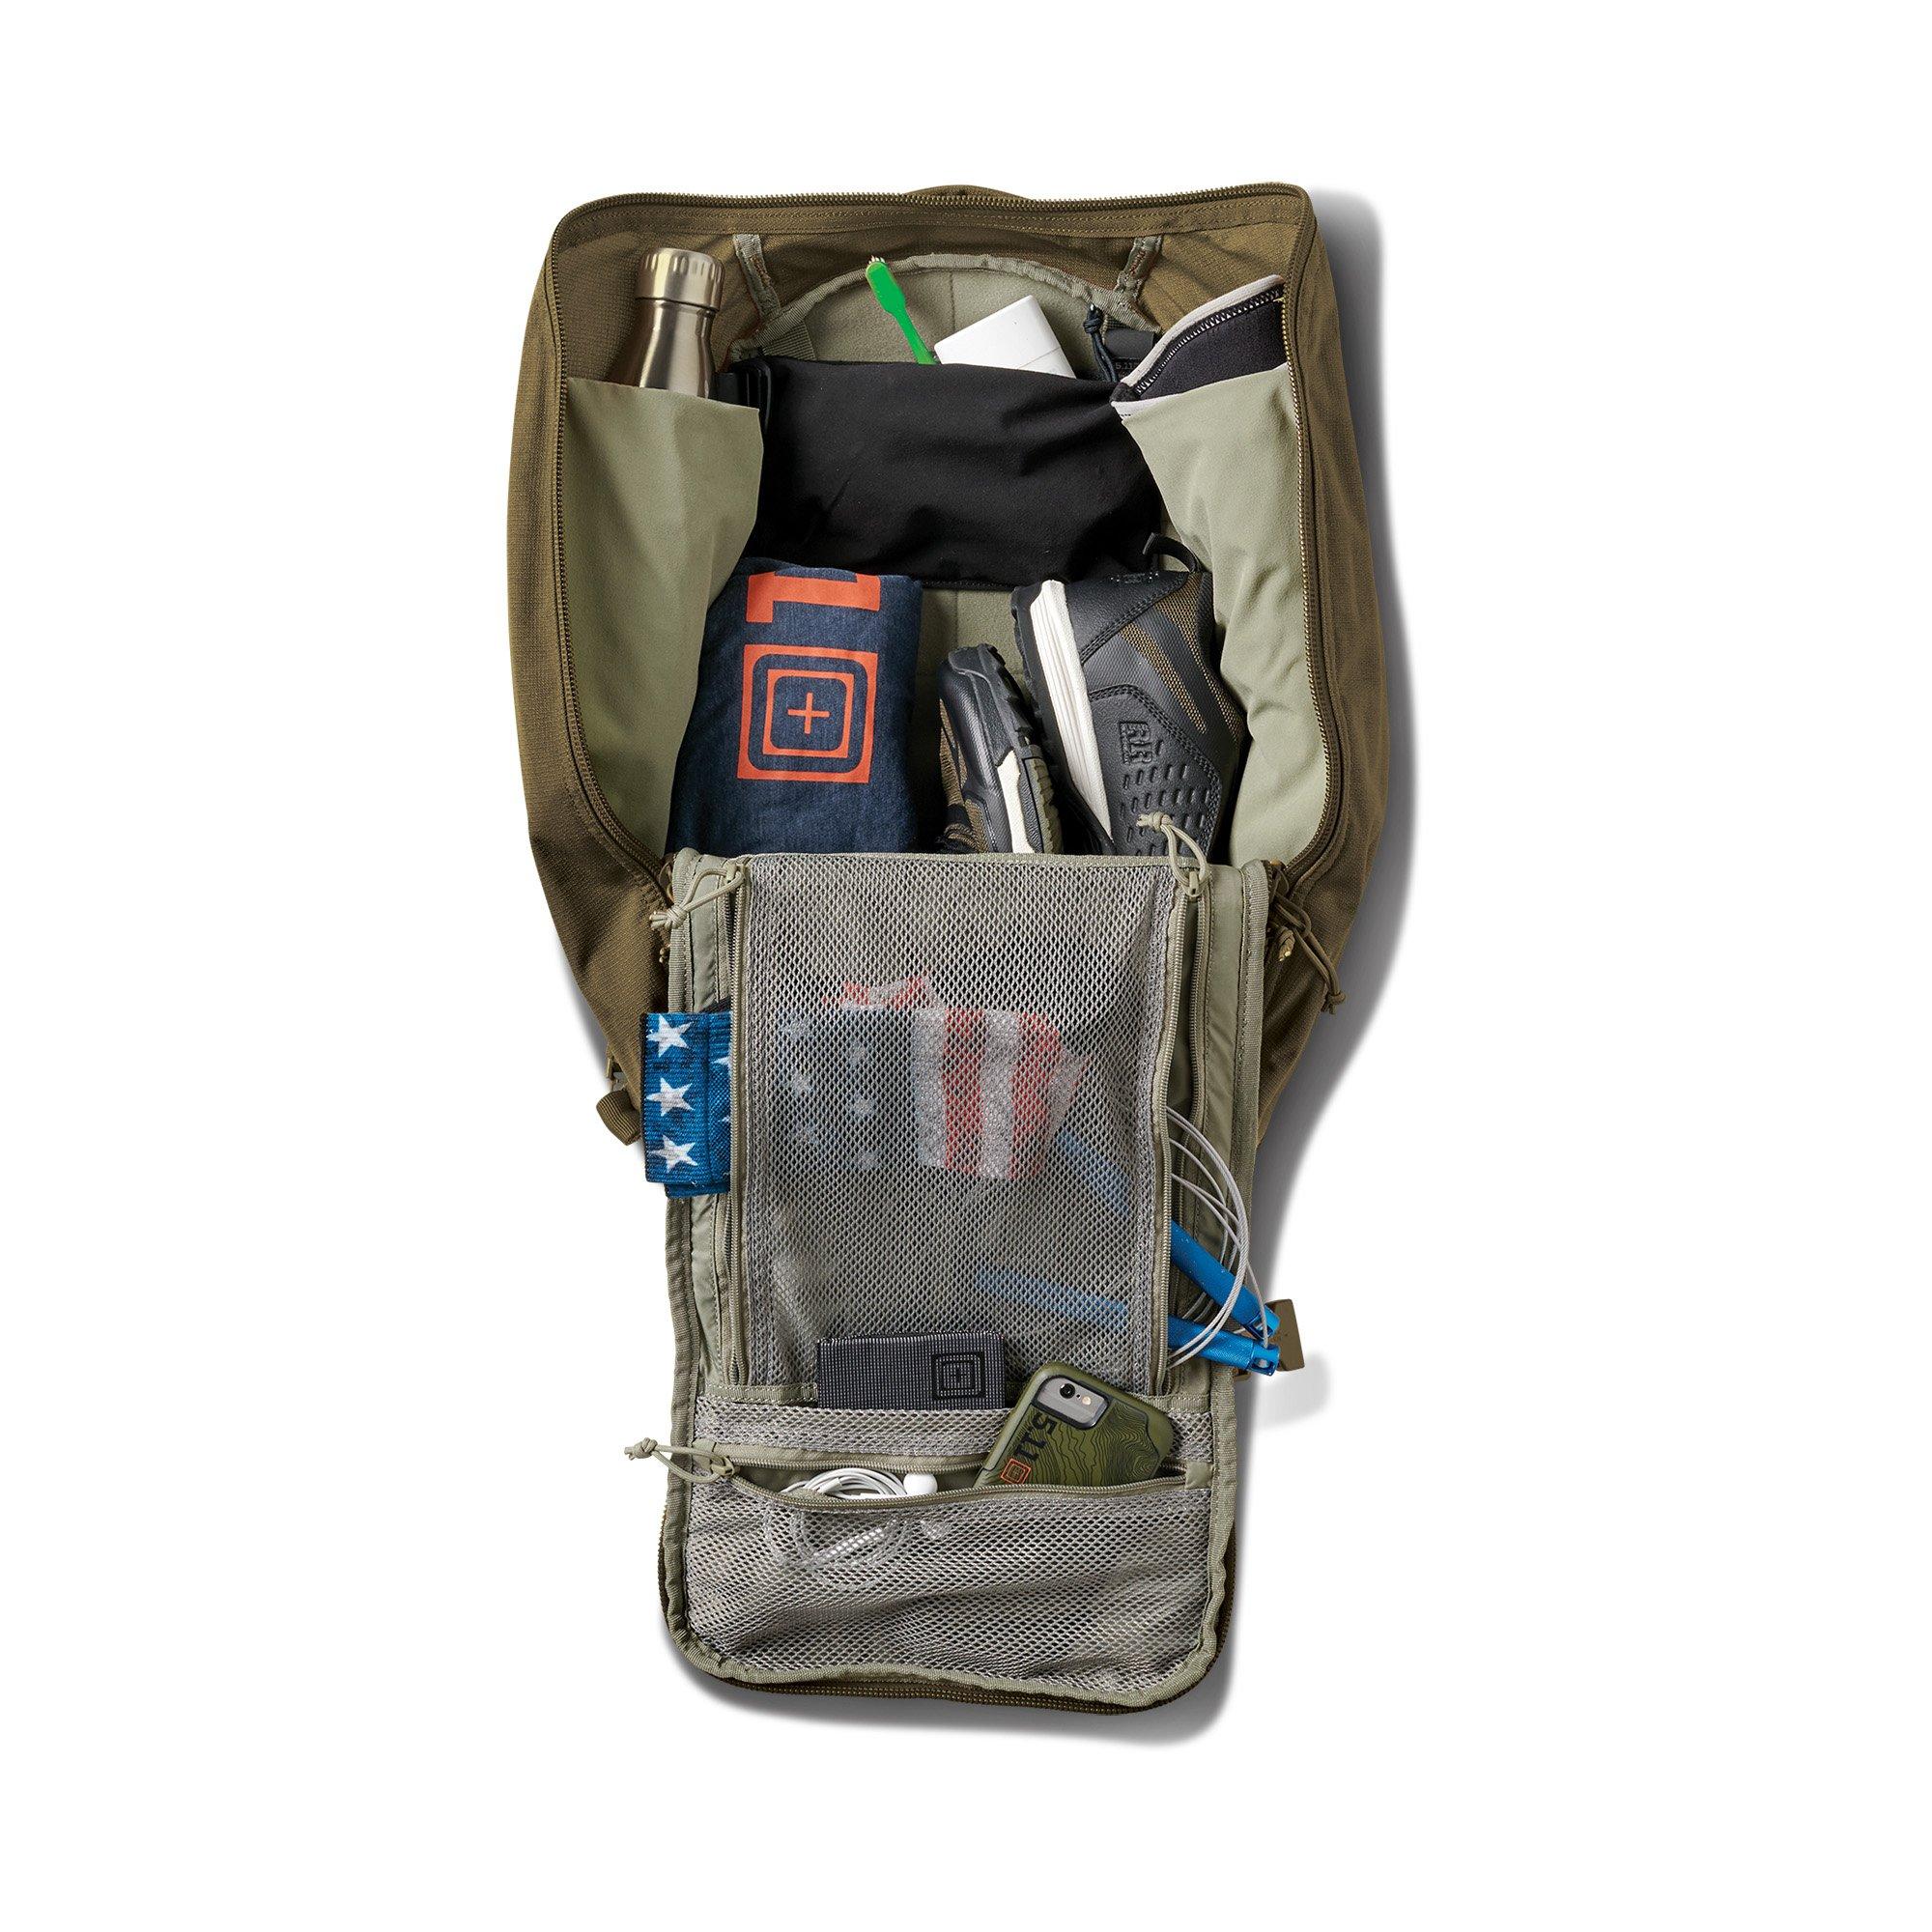 Balo 5.11 Tactical AMP24™ 32L – Ranger Green